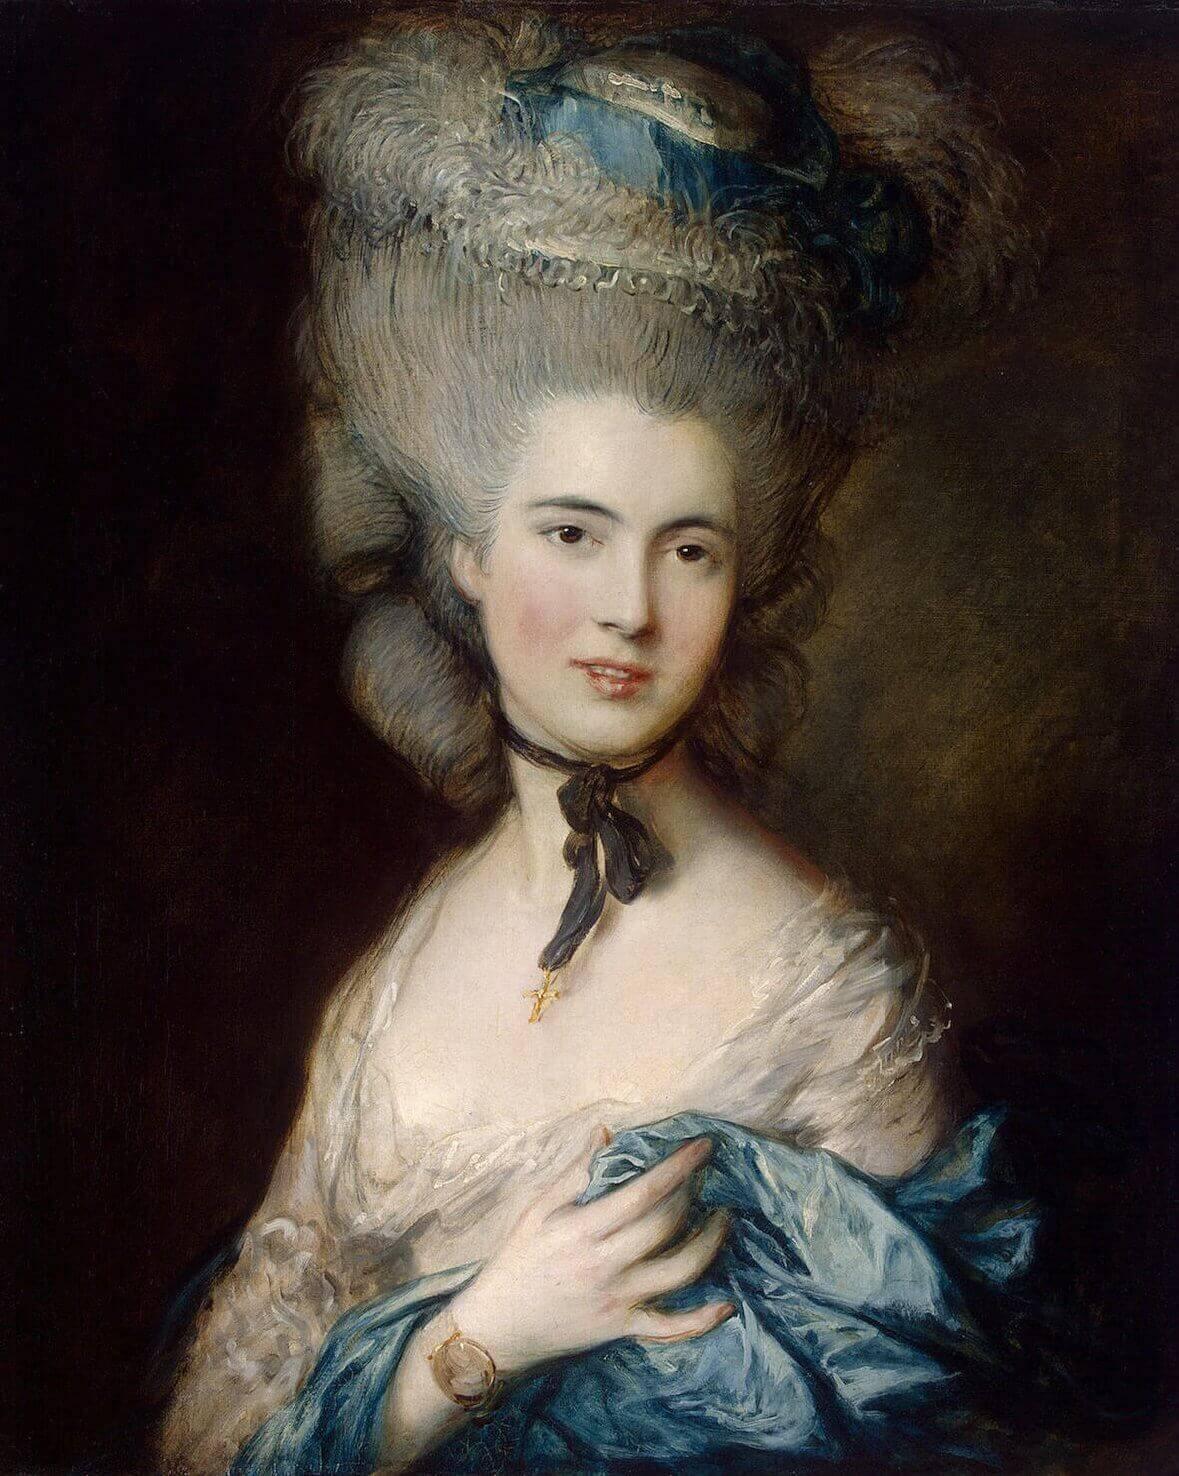 Thomas Gainsborough. Portrait of a Lady in Blue. 1778-1782